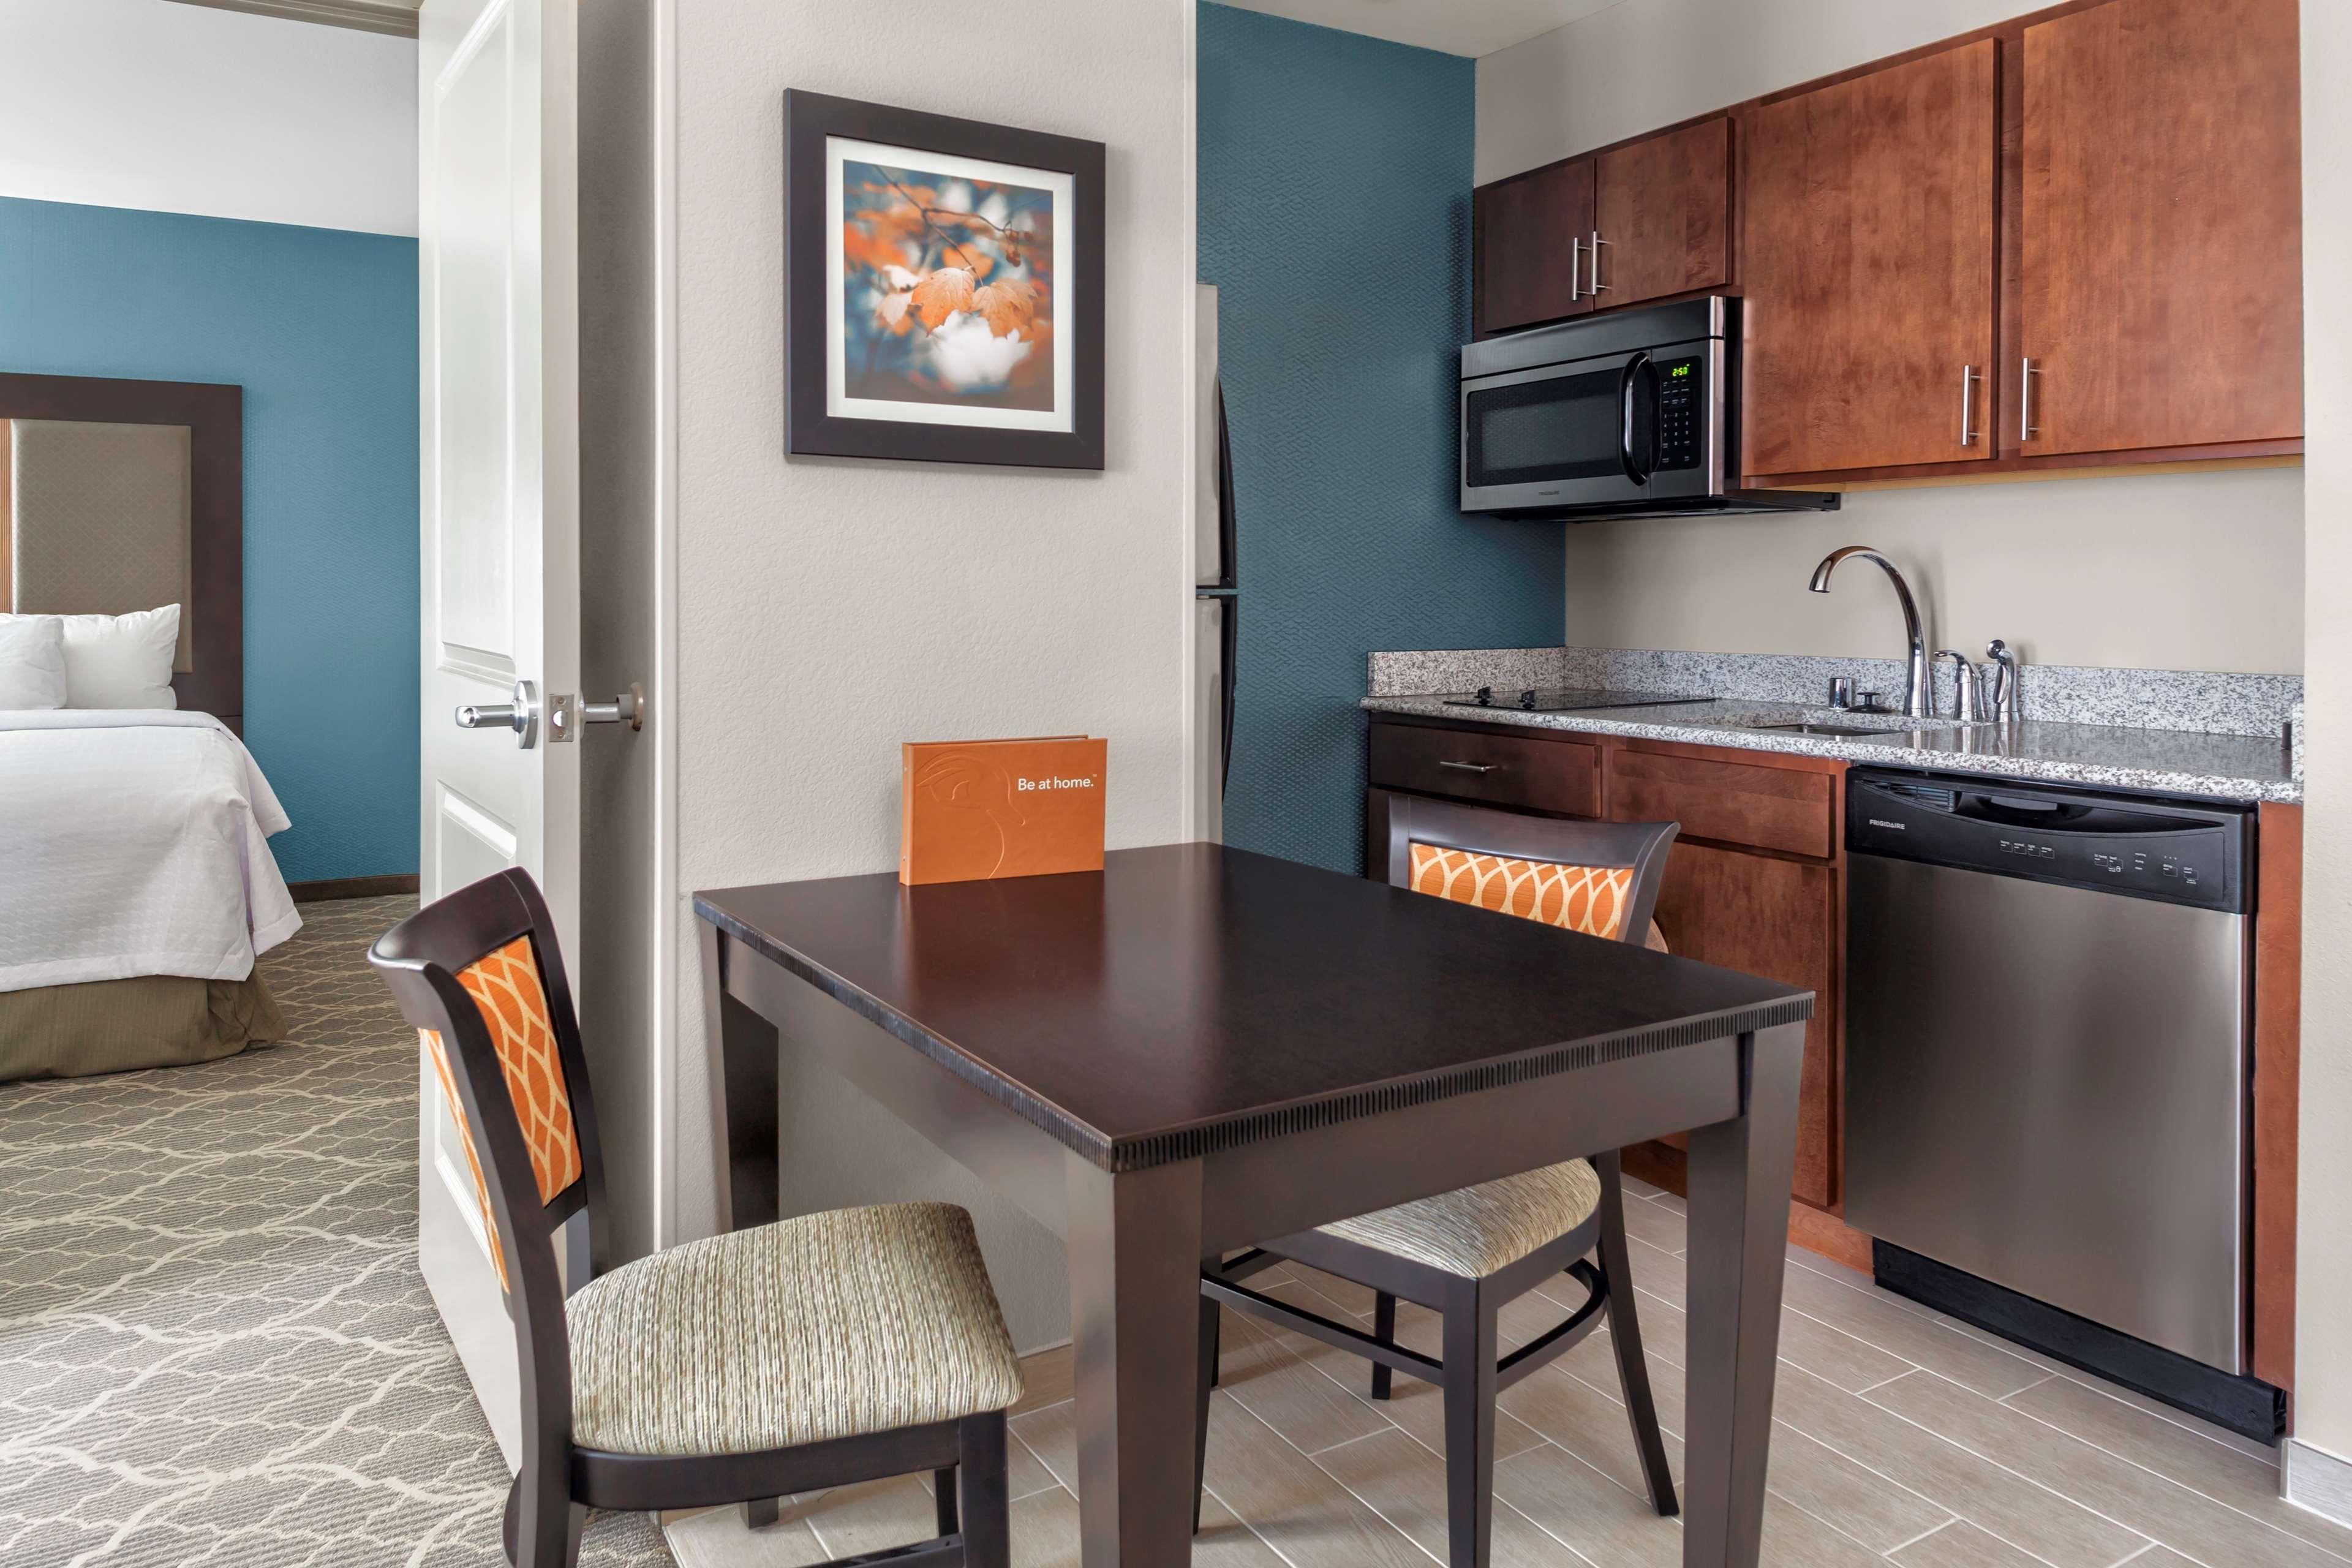 Homewood Suites by Hilton Wauwatosa Milwaukee image 18